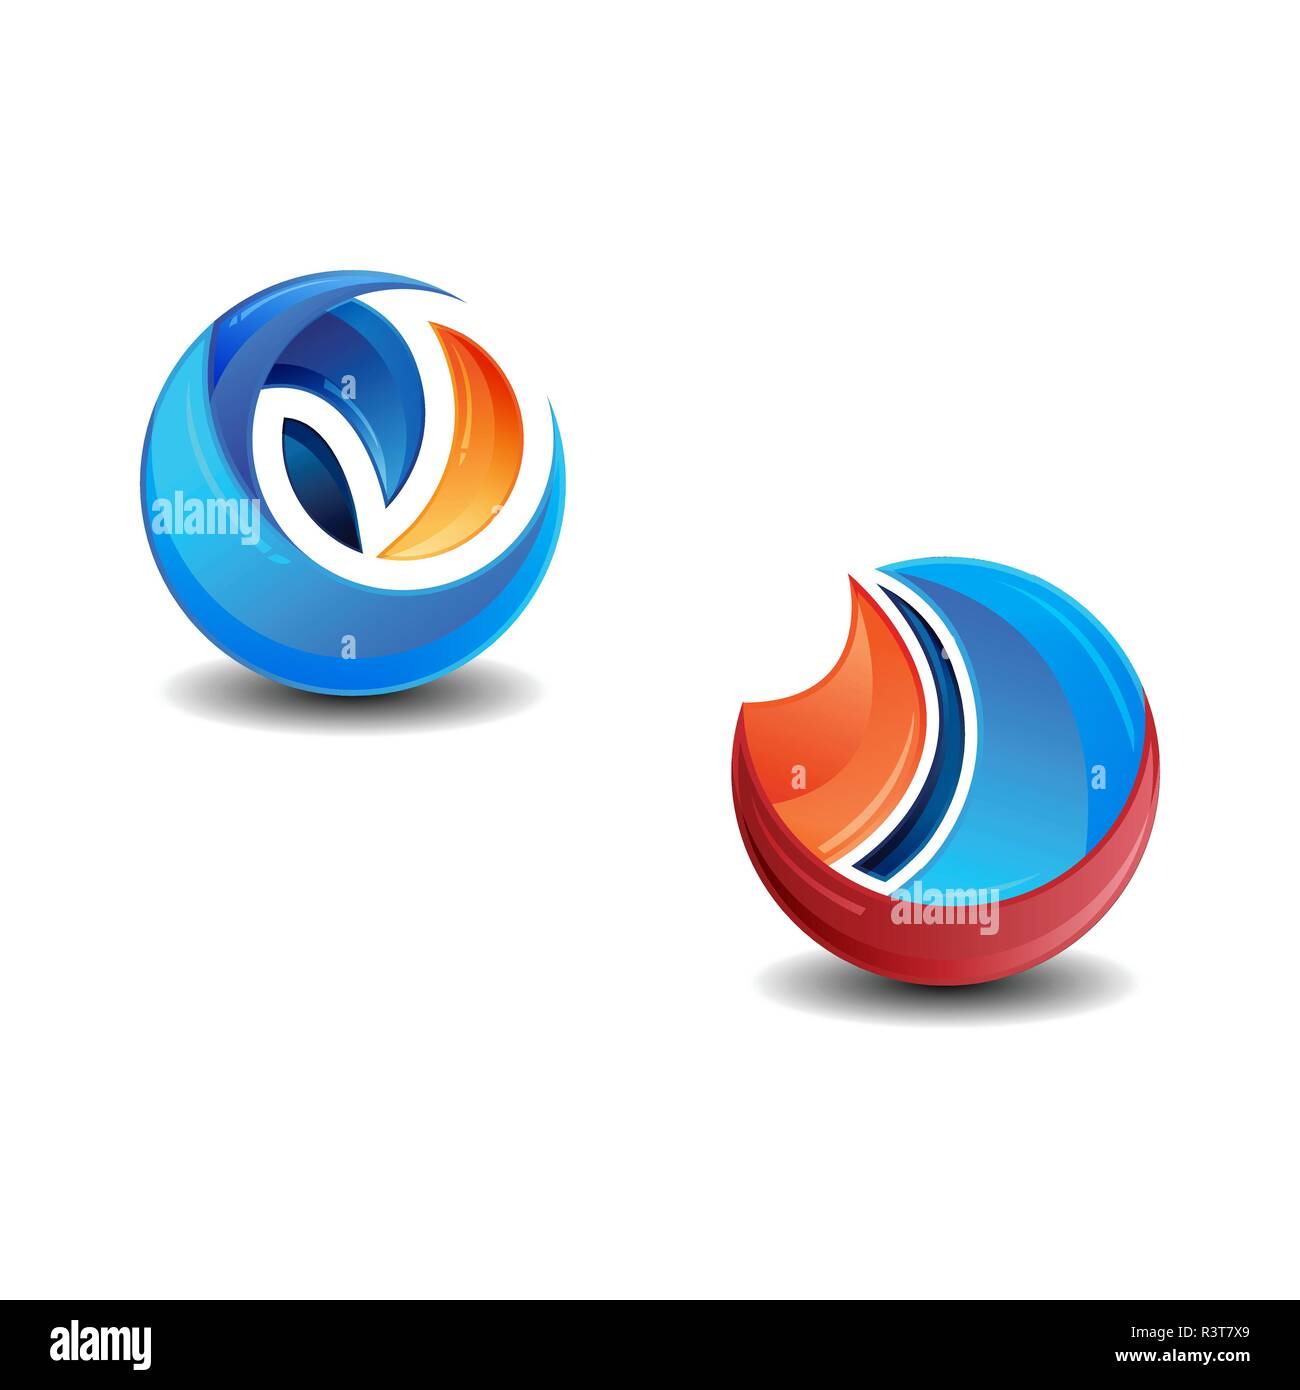 d74e1a41dc1b3 Vector circle ring logo design. Abstract circle logo template. Round ring  circle and infinity loop symbol, technology icon, circle line logo. Company